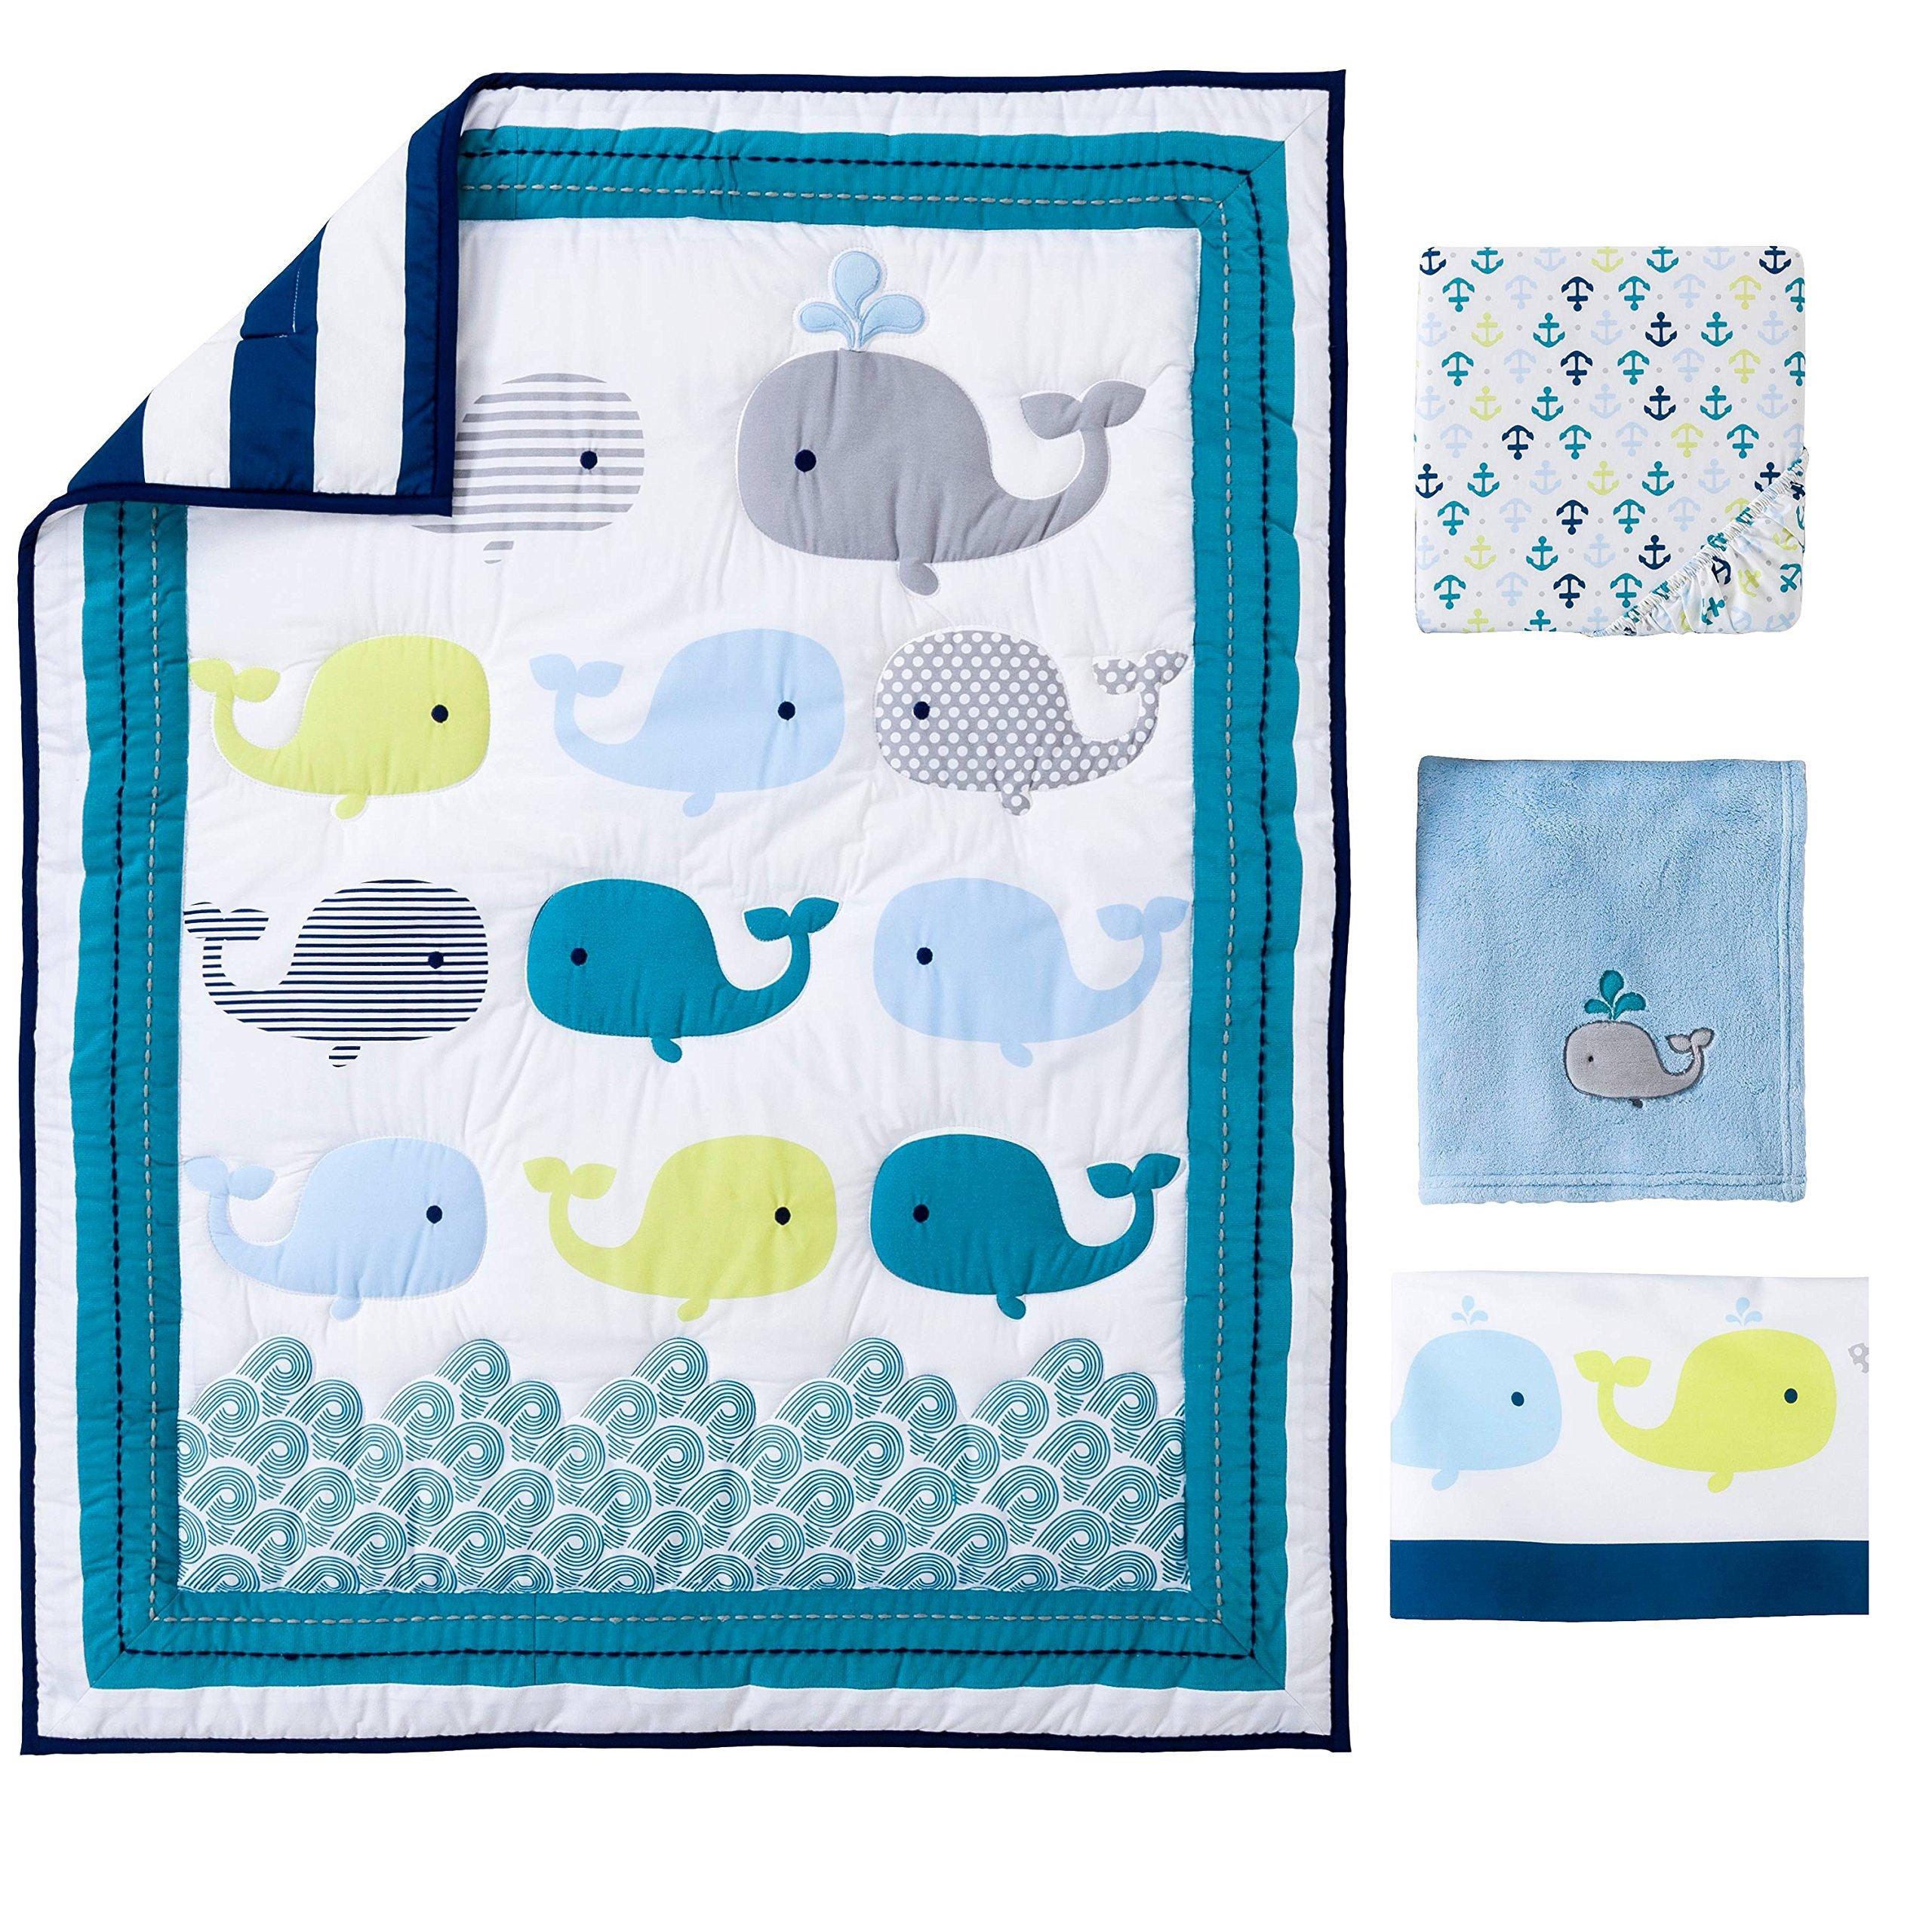 Ocean Whale Crib Bedding 4pcs set Baby Bedding Set Nursery With Comforter Blanket